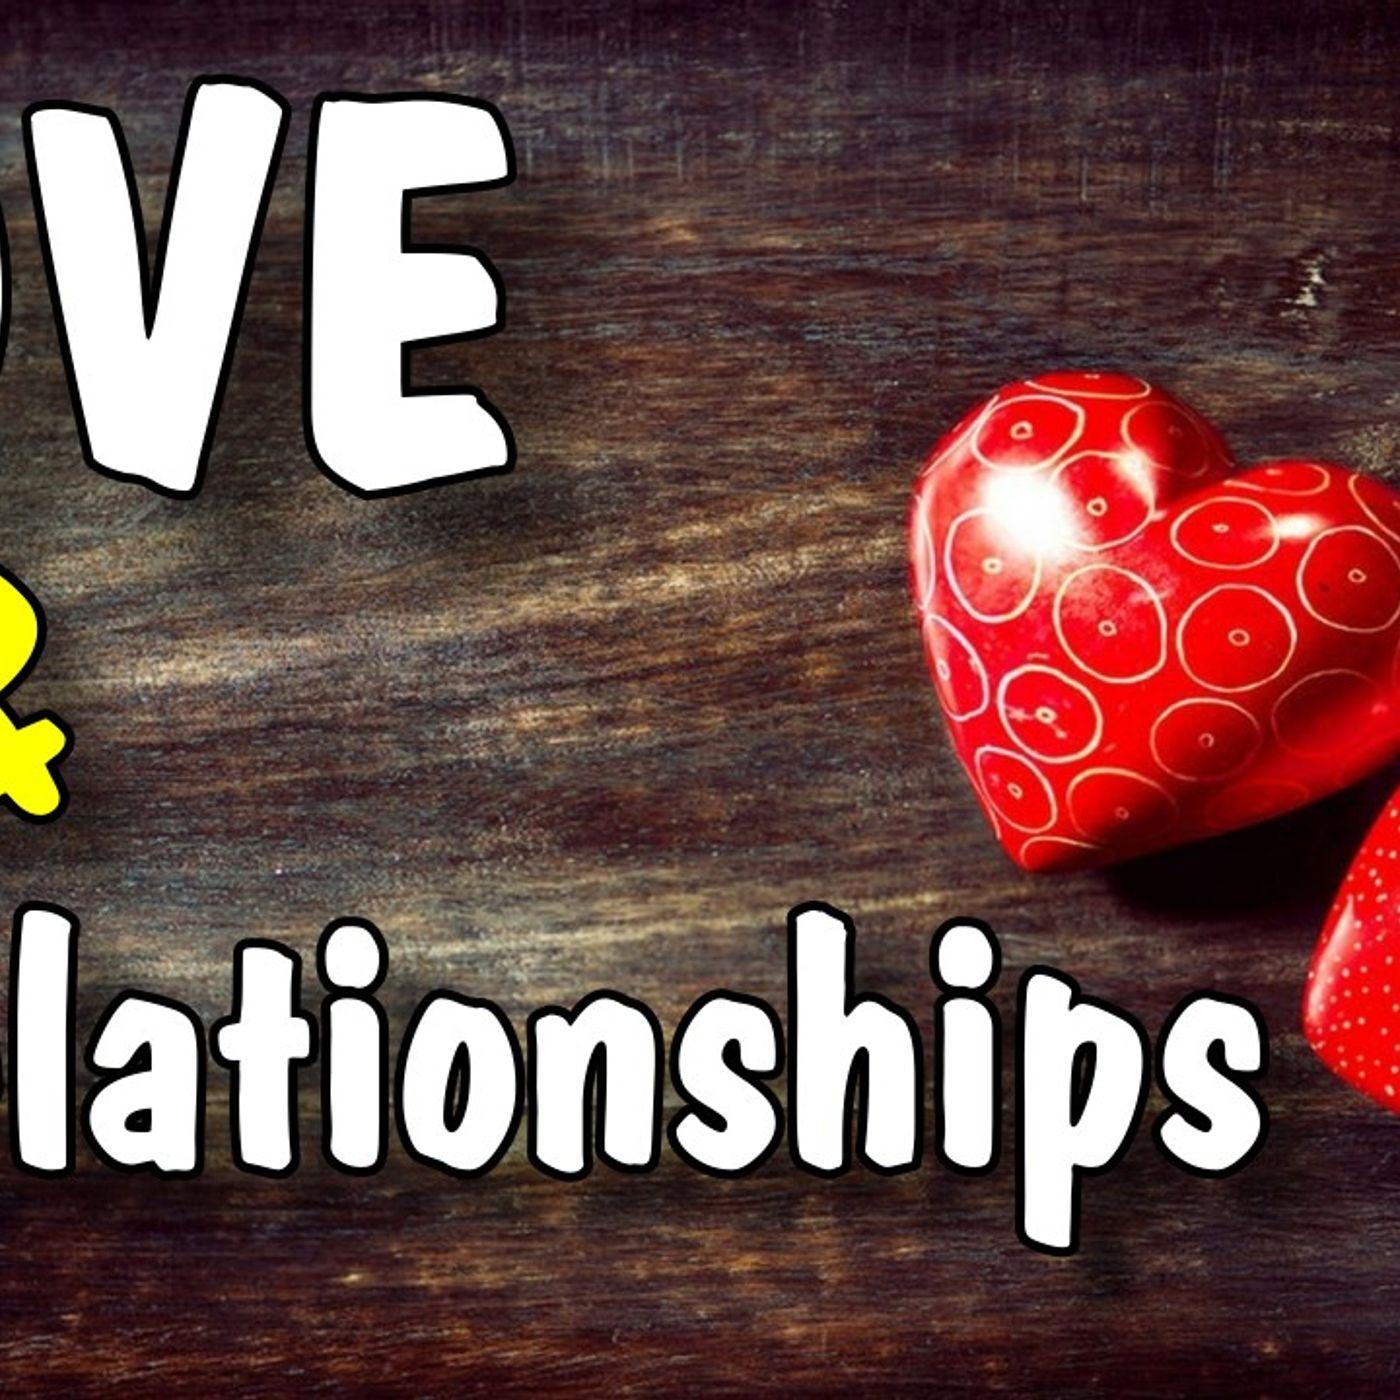 Love & Relationships, Arizona Talk Radio's Rob & Derek Hosting, Lisamarie Monaco & Helen Cernigliaro, Pt.2